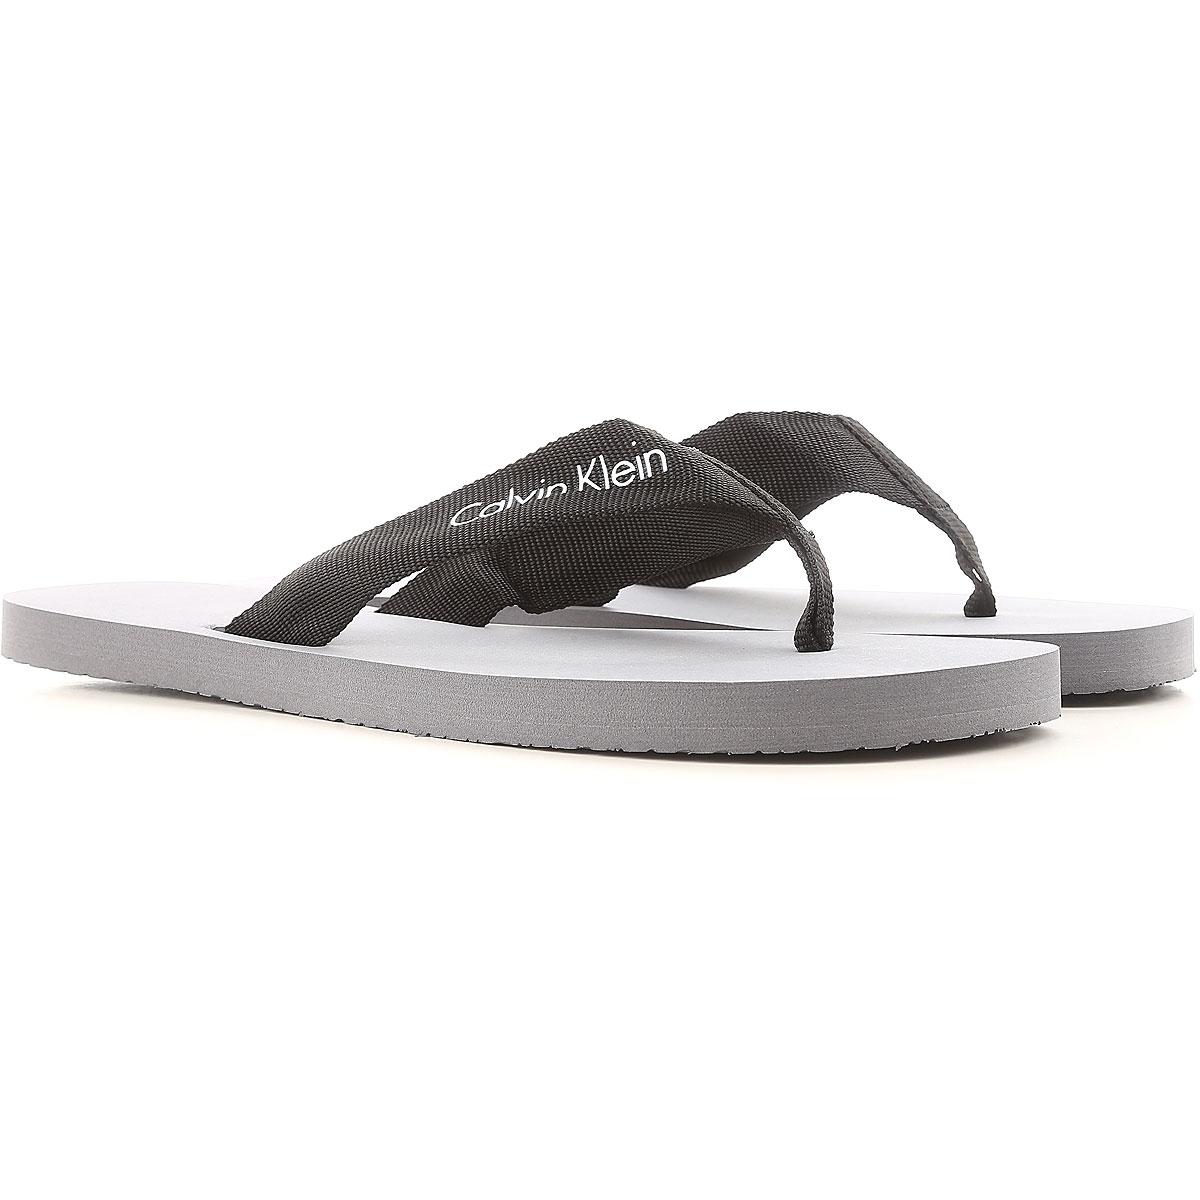 Calvin Klein Sandals for Men, Grey, Rubber, 2017, S - 39 / 40  M - 41 / 42 L - 43 / 44 USA-451830